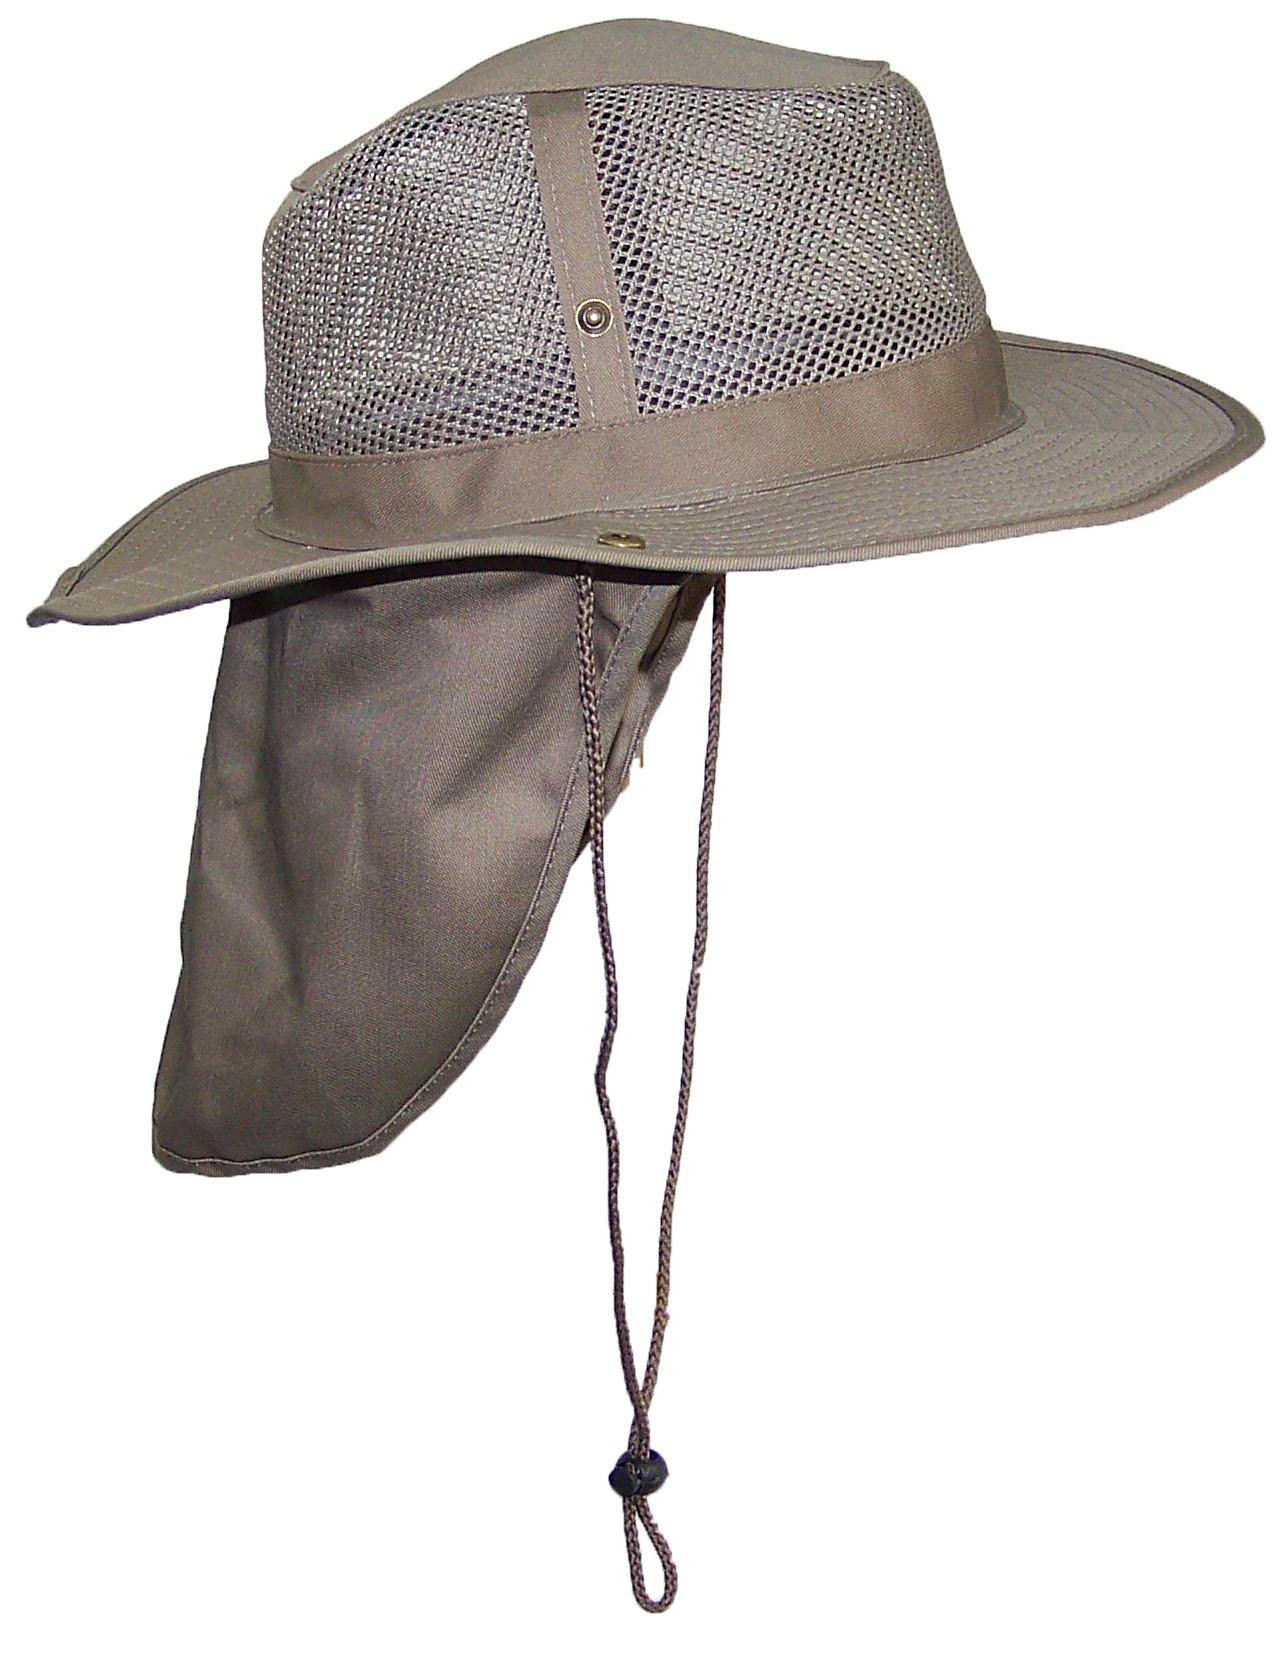 Tropic Hats Summer Wide Brim Mesh Safari/Outback W/Neck Flap & Snap up Sides - Tan M